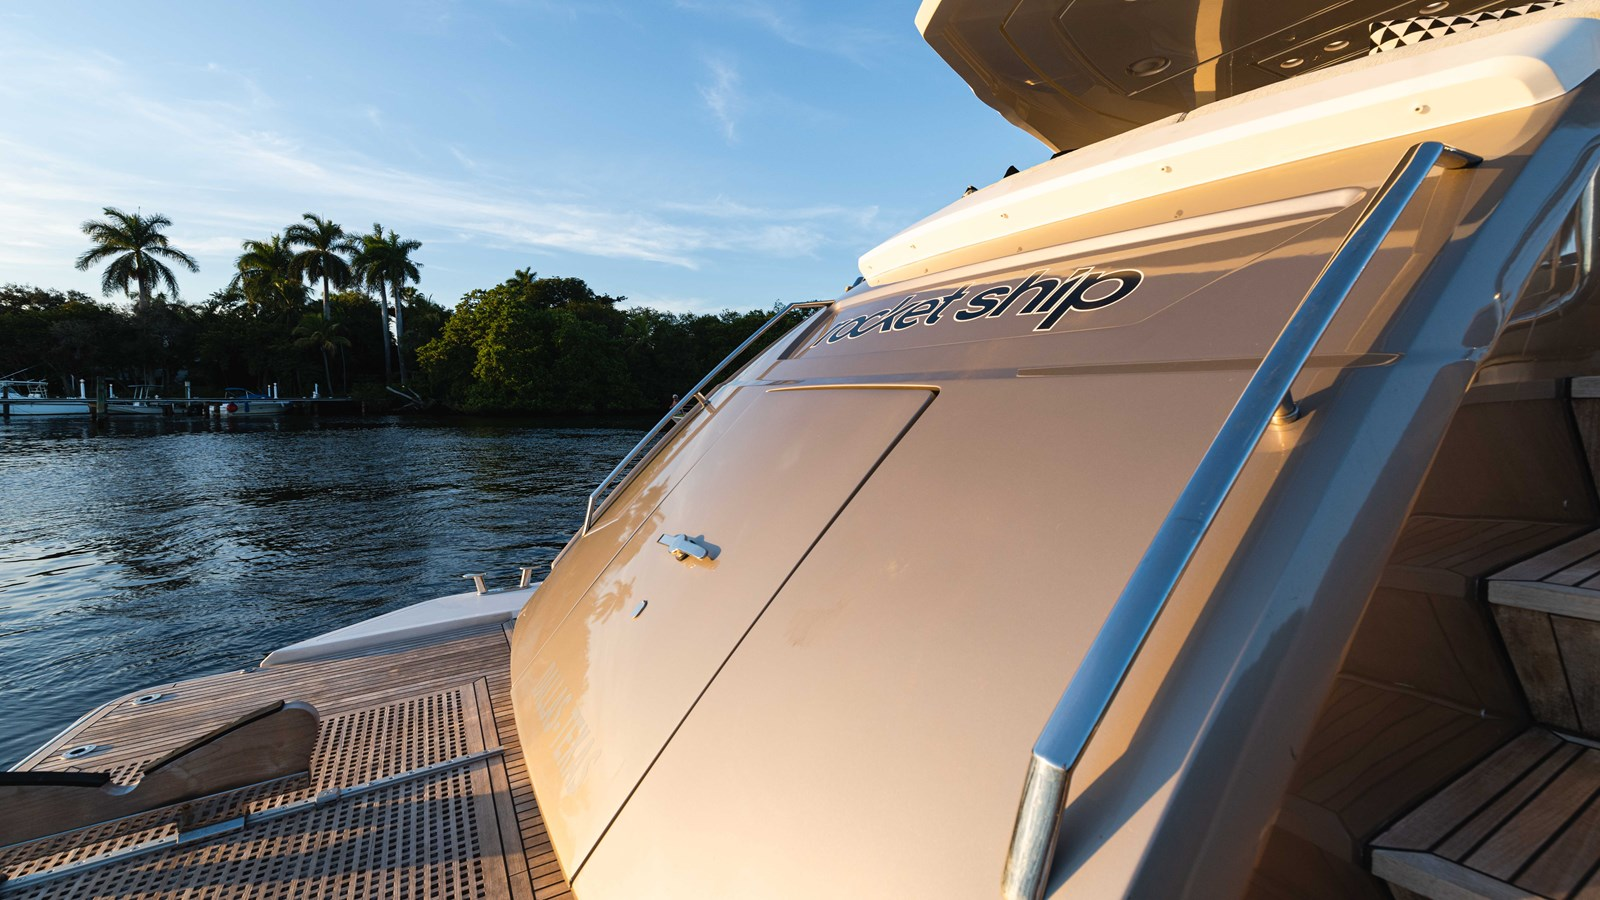 76 Monte Carlo (75 of 127) 2014 MONTE CARLO YACHTS Motoryacht Motor Yacht 2825053